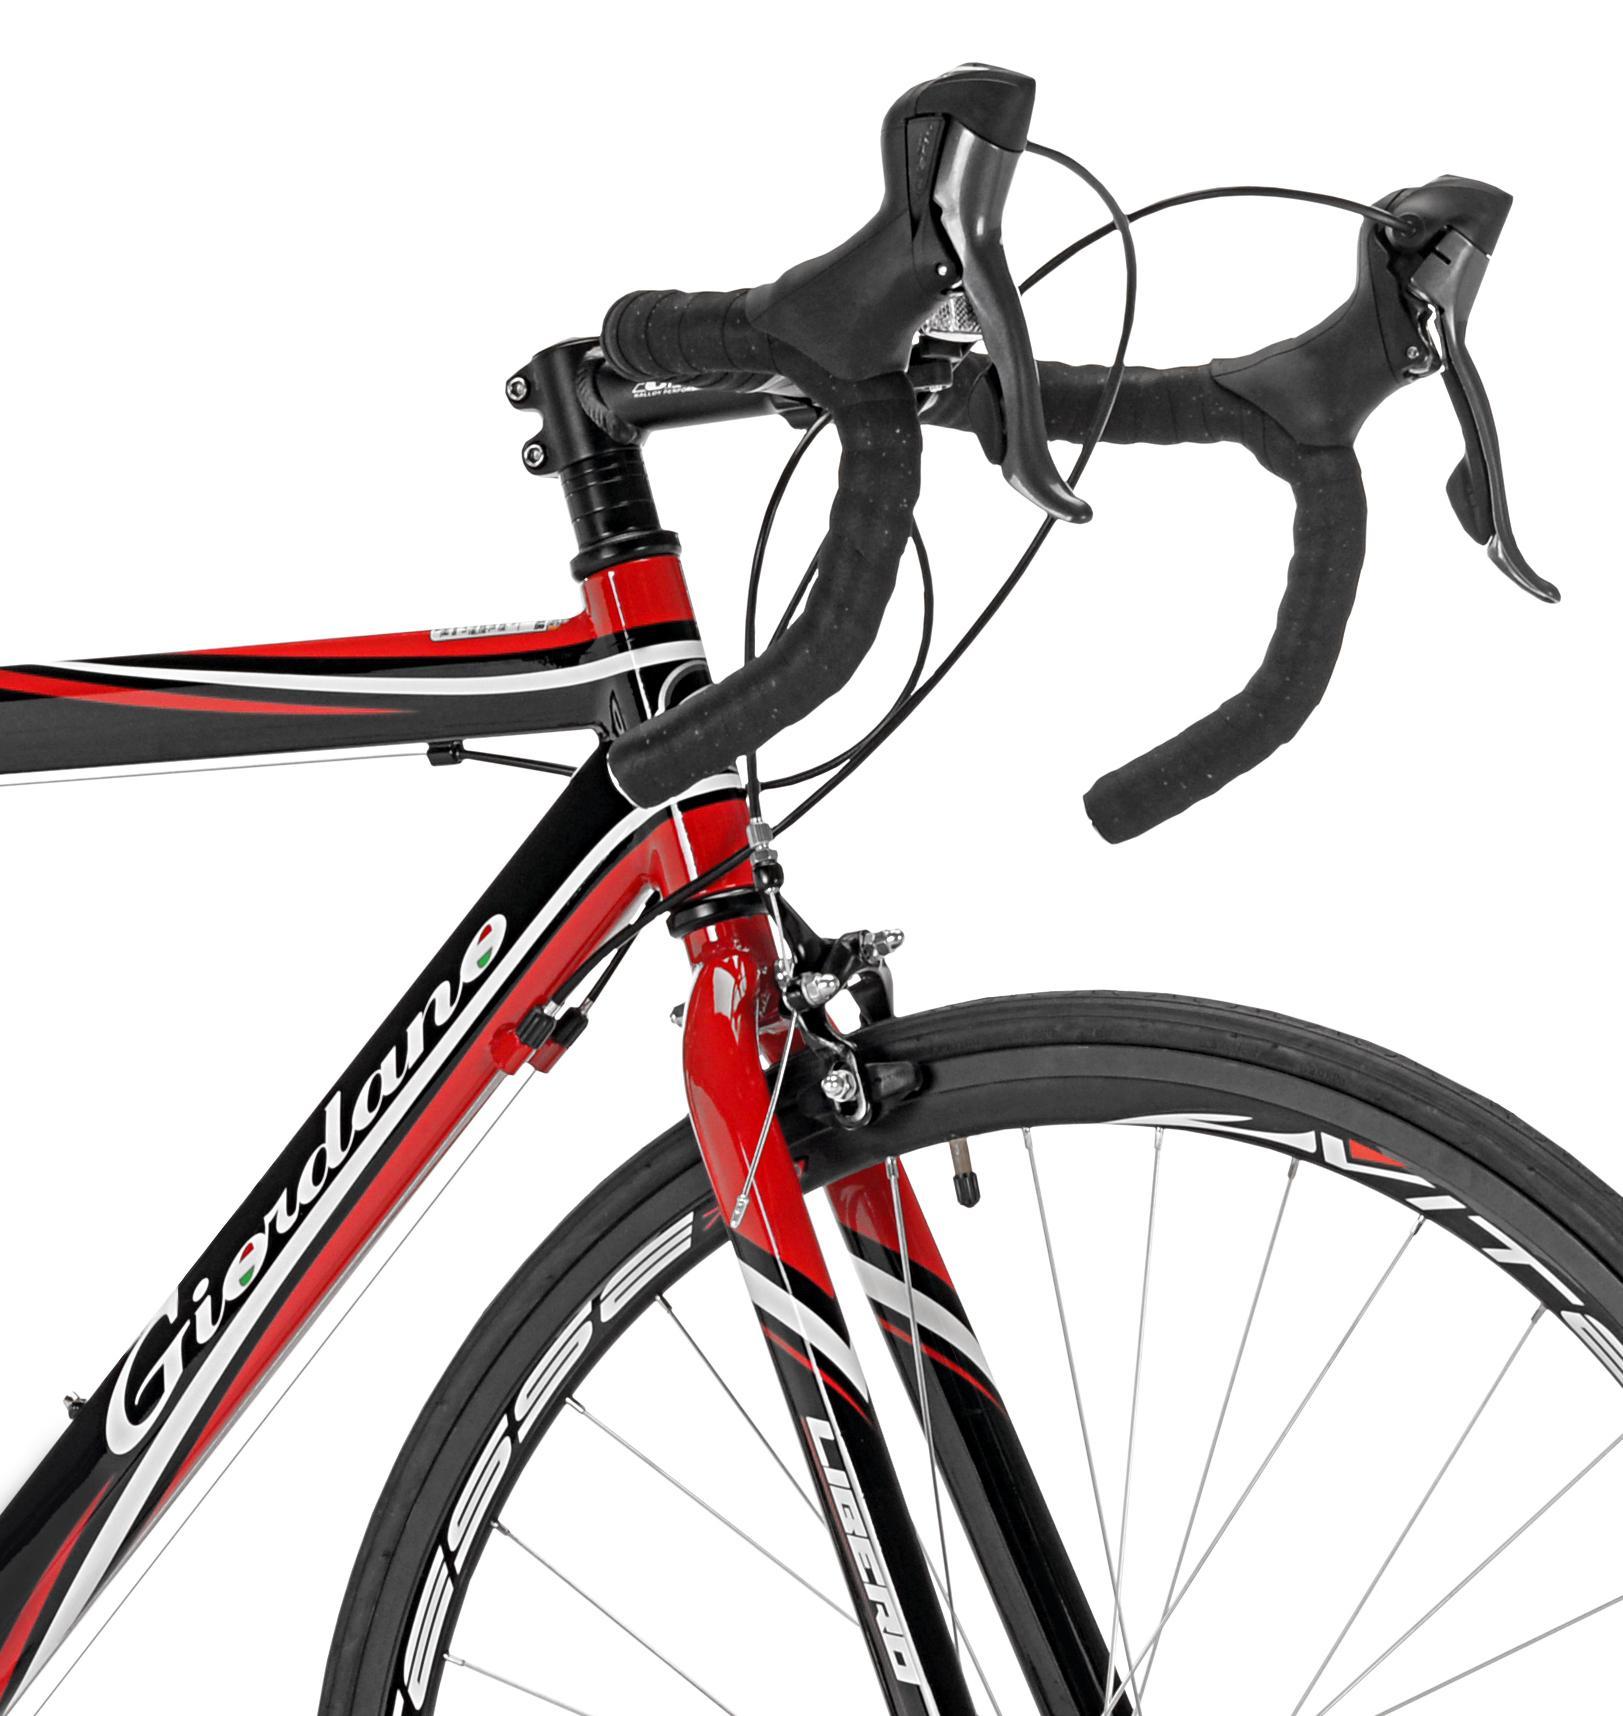 Giordano libero 1.6 road bike rebiew